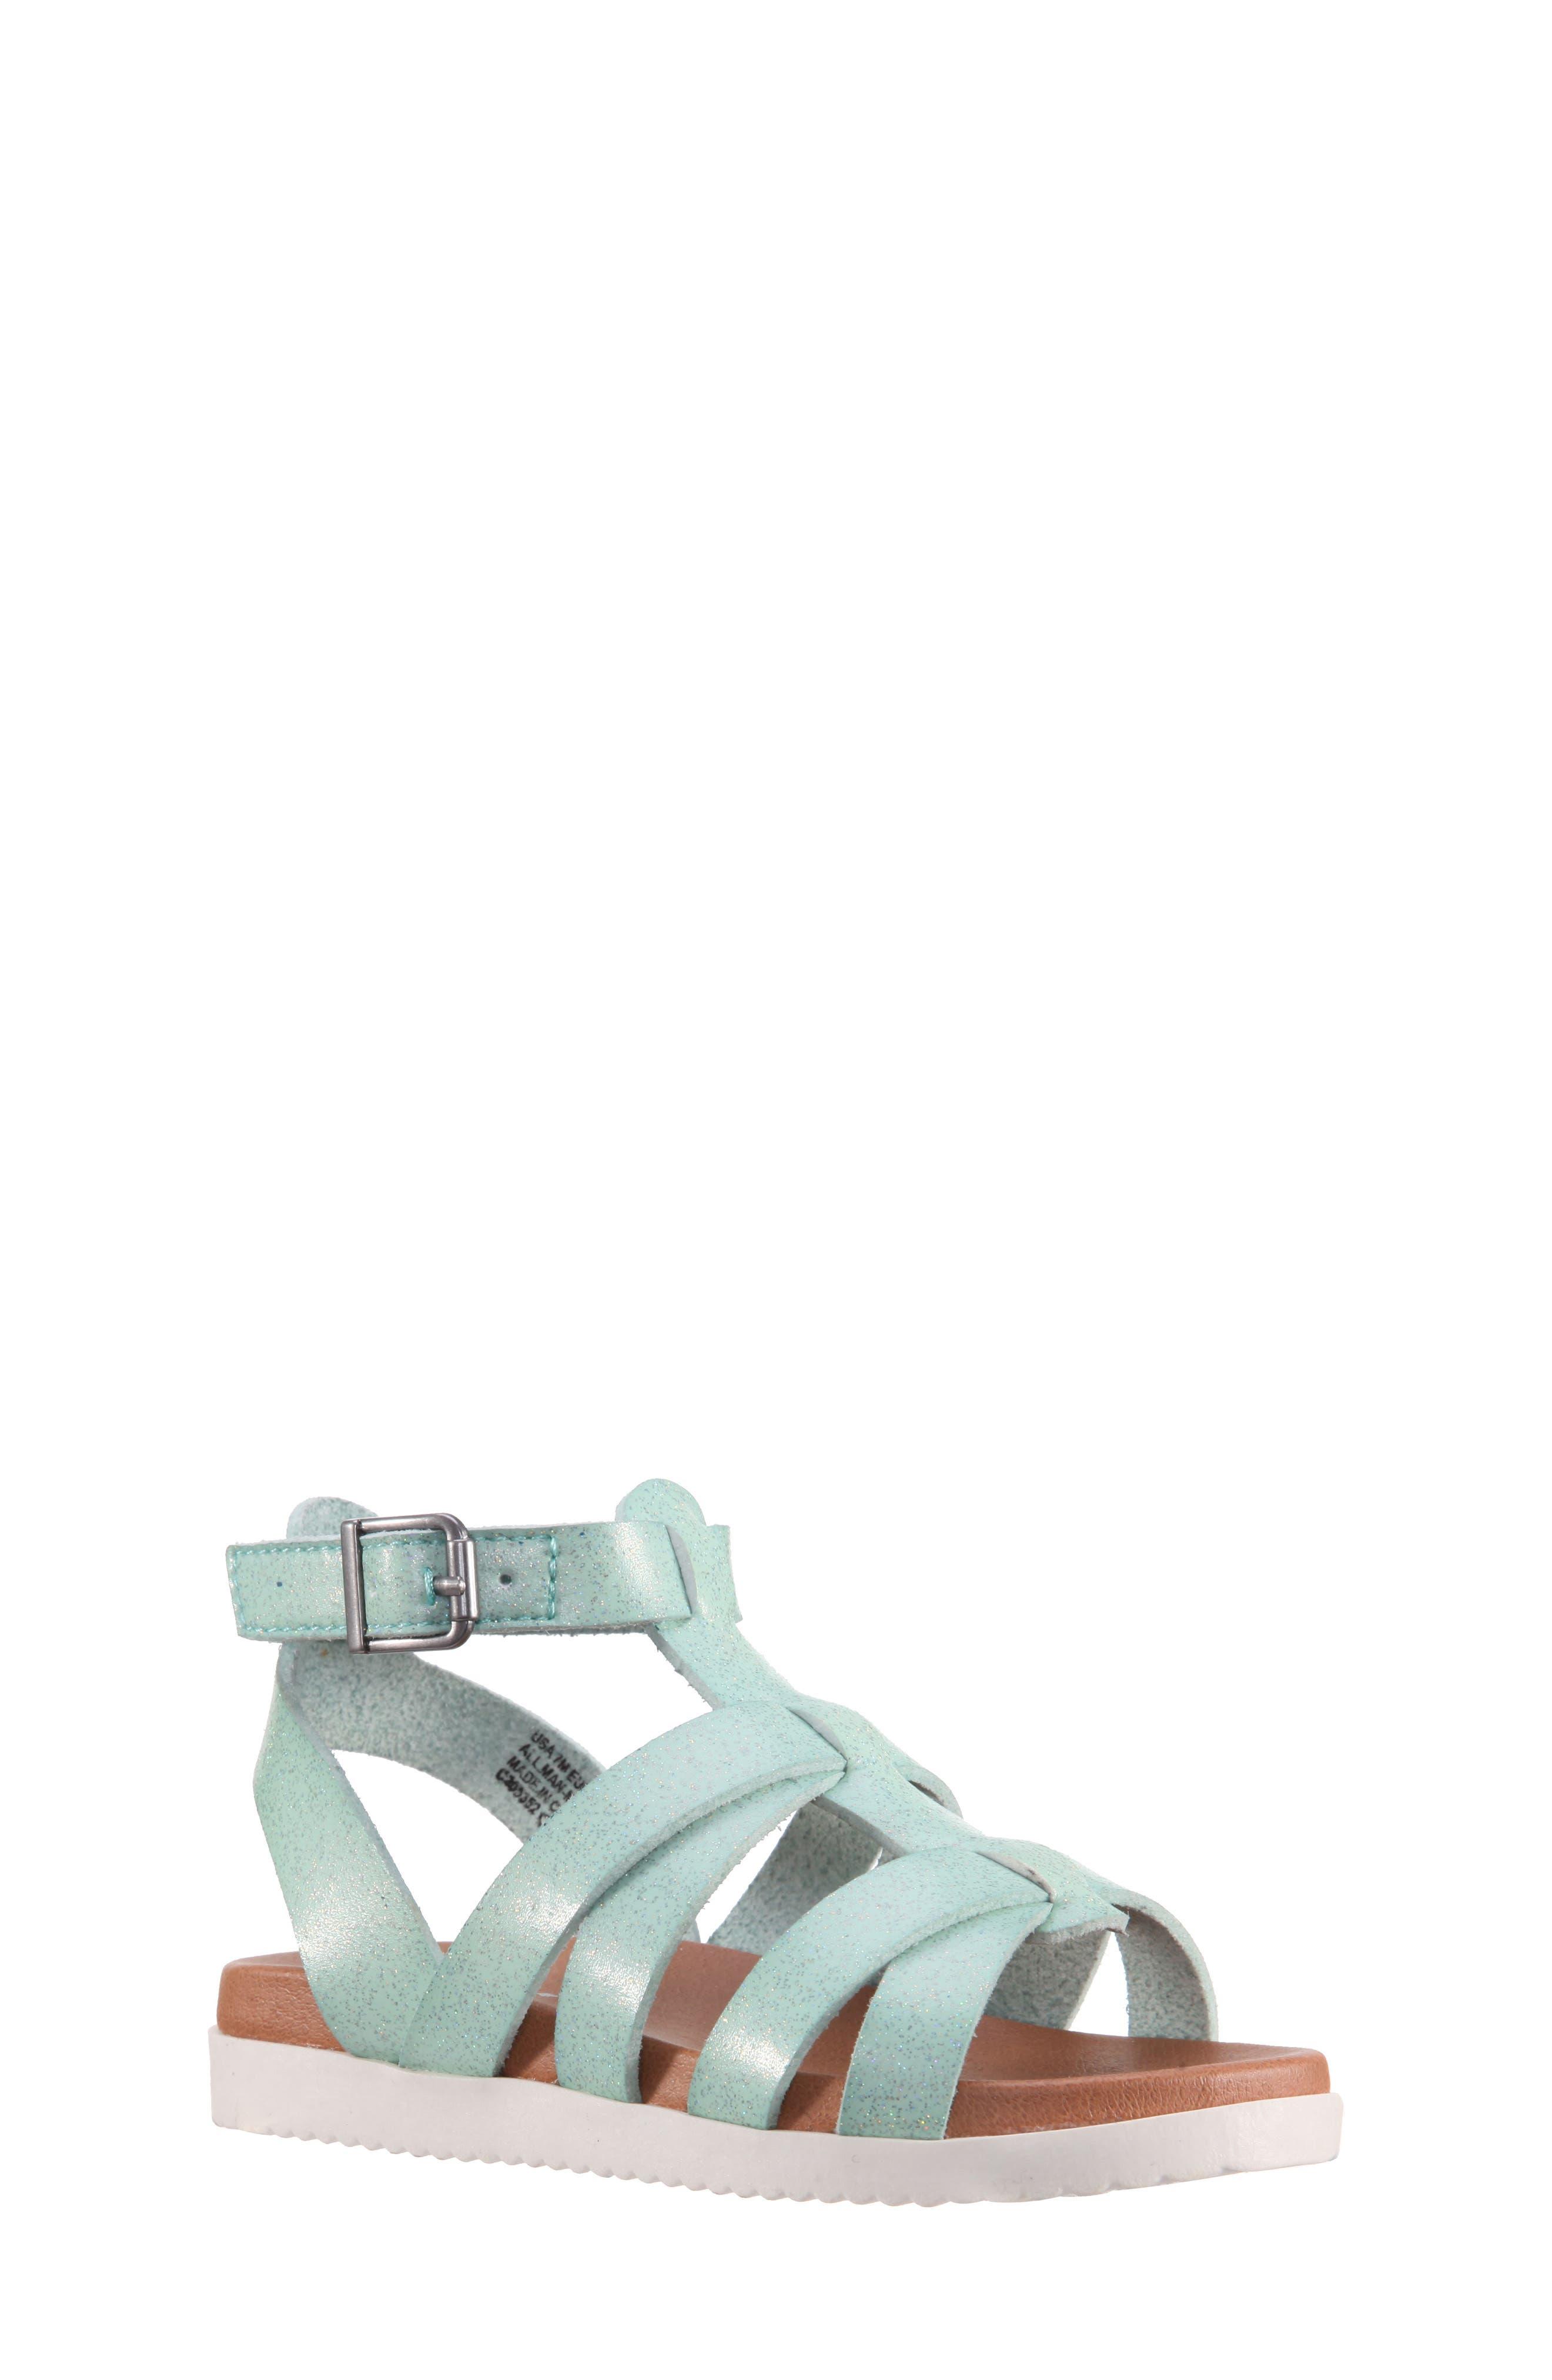 Alpha Gladiator Sandal,                         Main,                         color, Mint Dip Dye